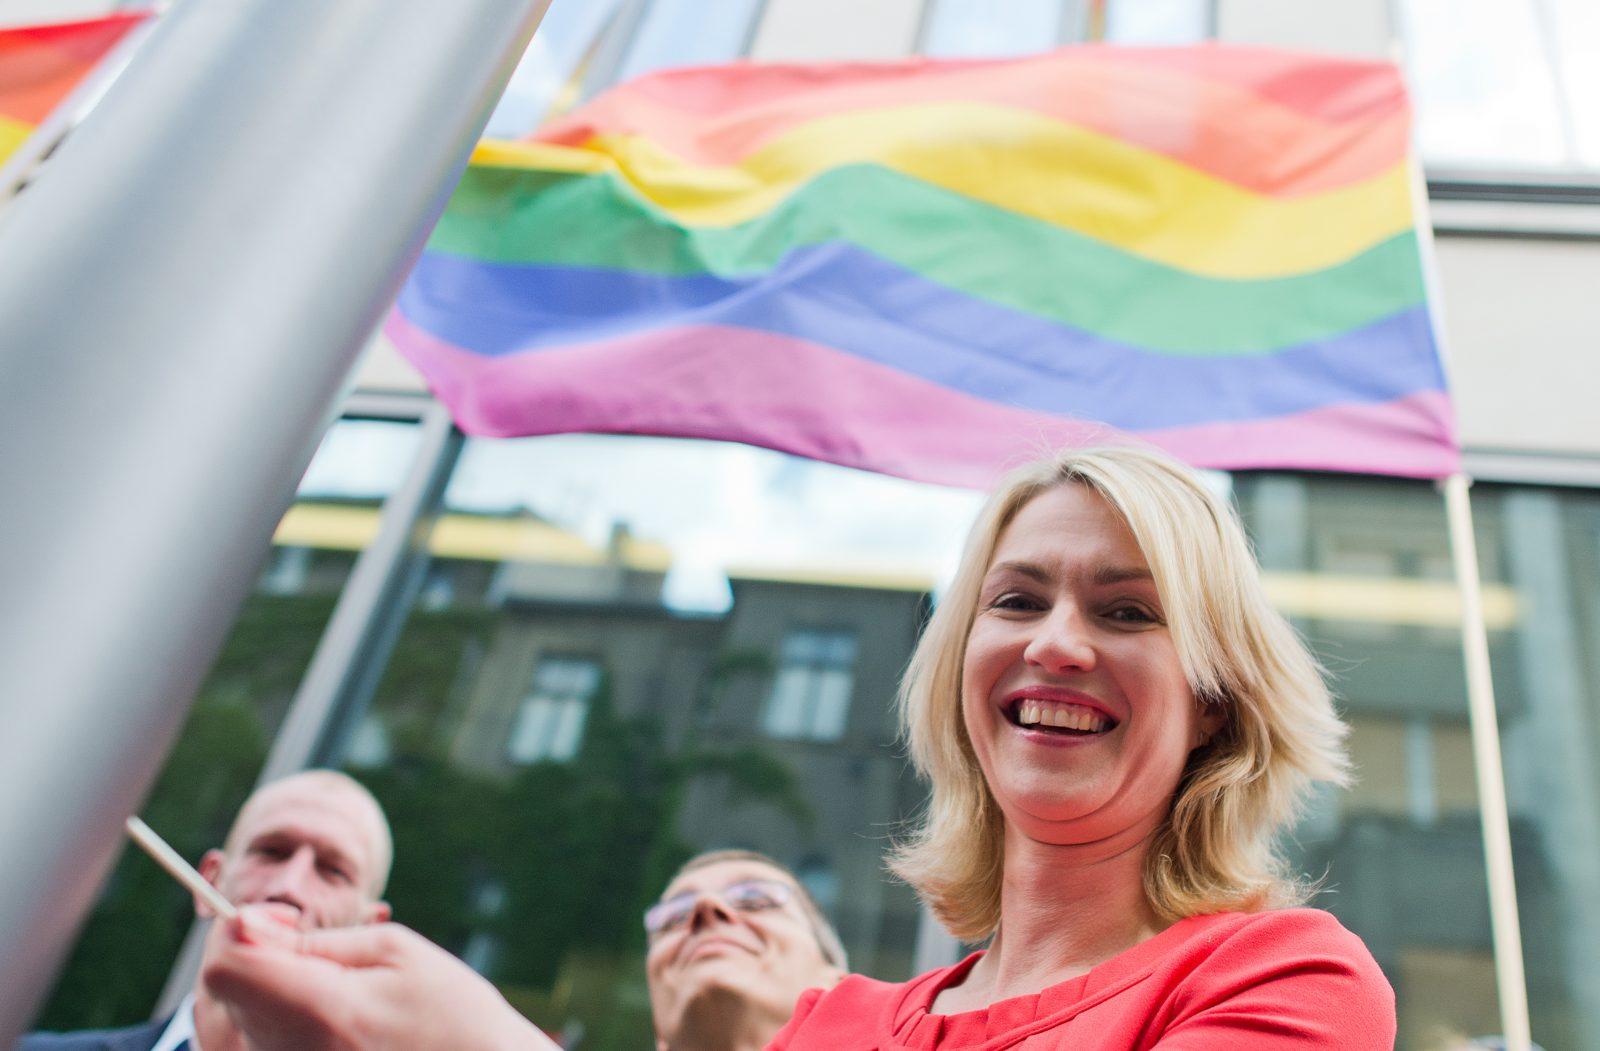 Die damalige Bundesfamilienministerin Manuela Schwesig (SPD) hißt die Regenbogenflagge vor ihrem Amtssitz (Archivbild) Foto: (c) dpa